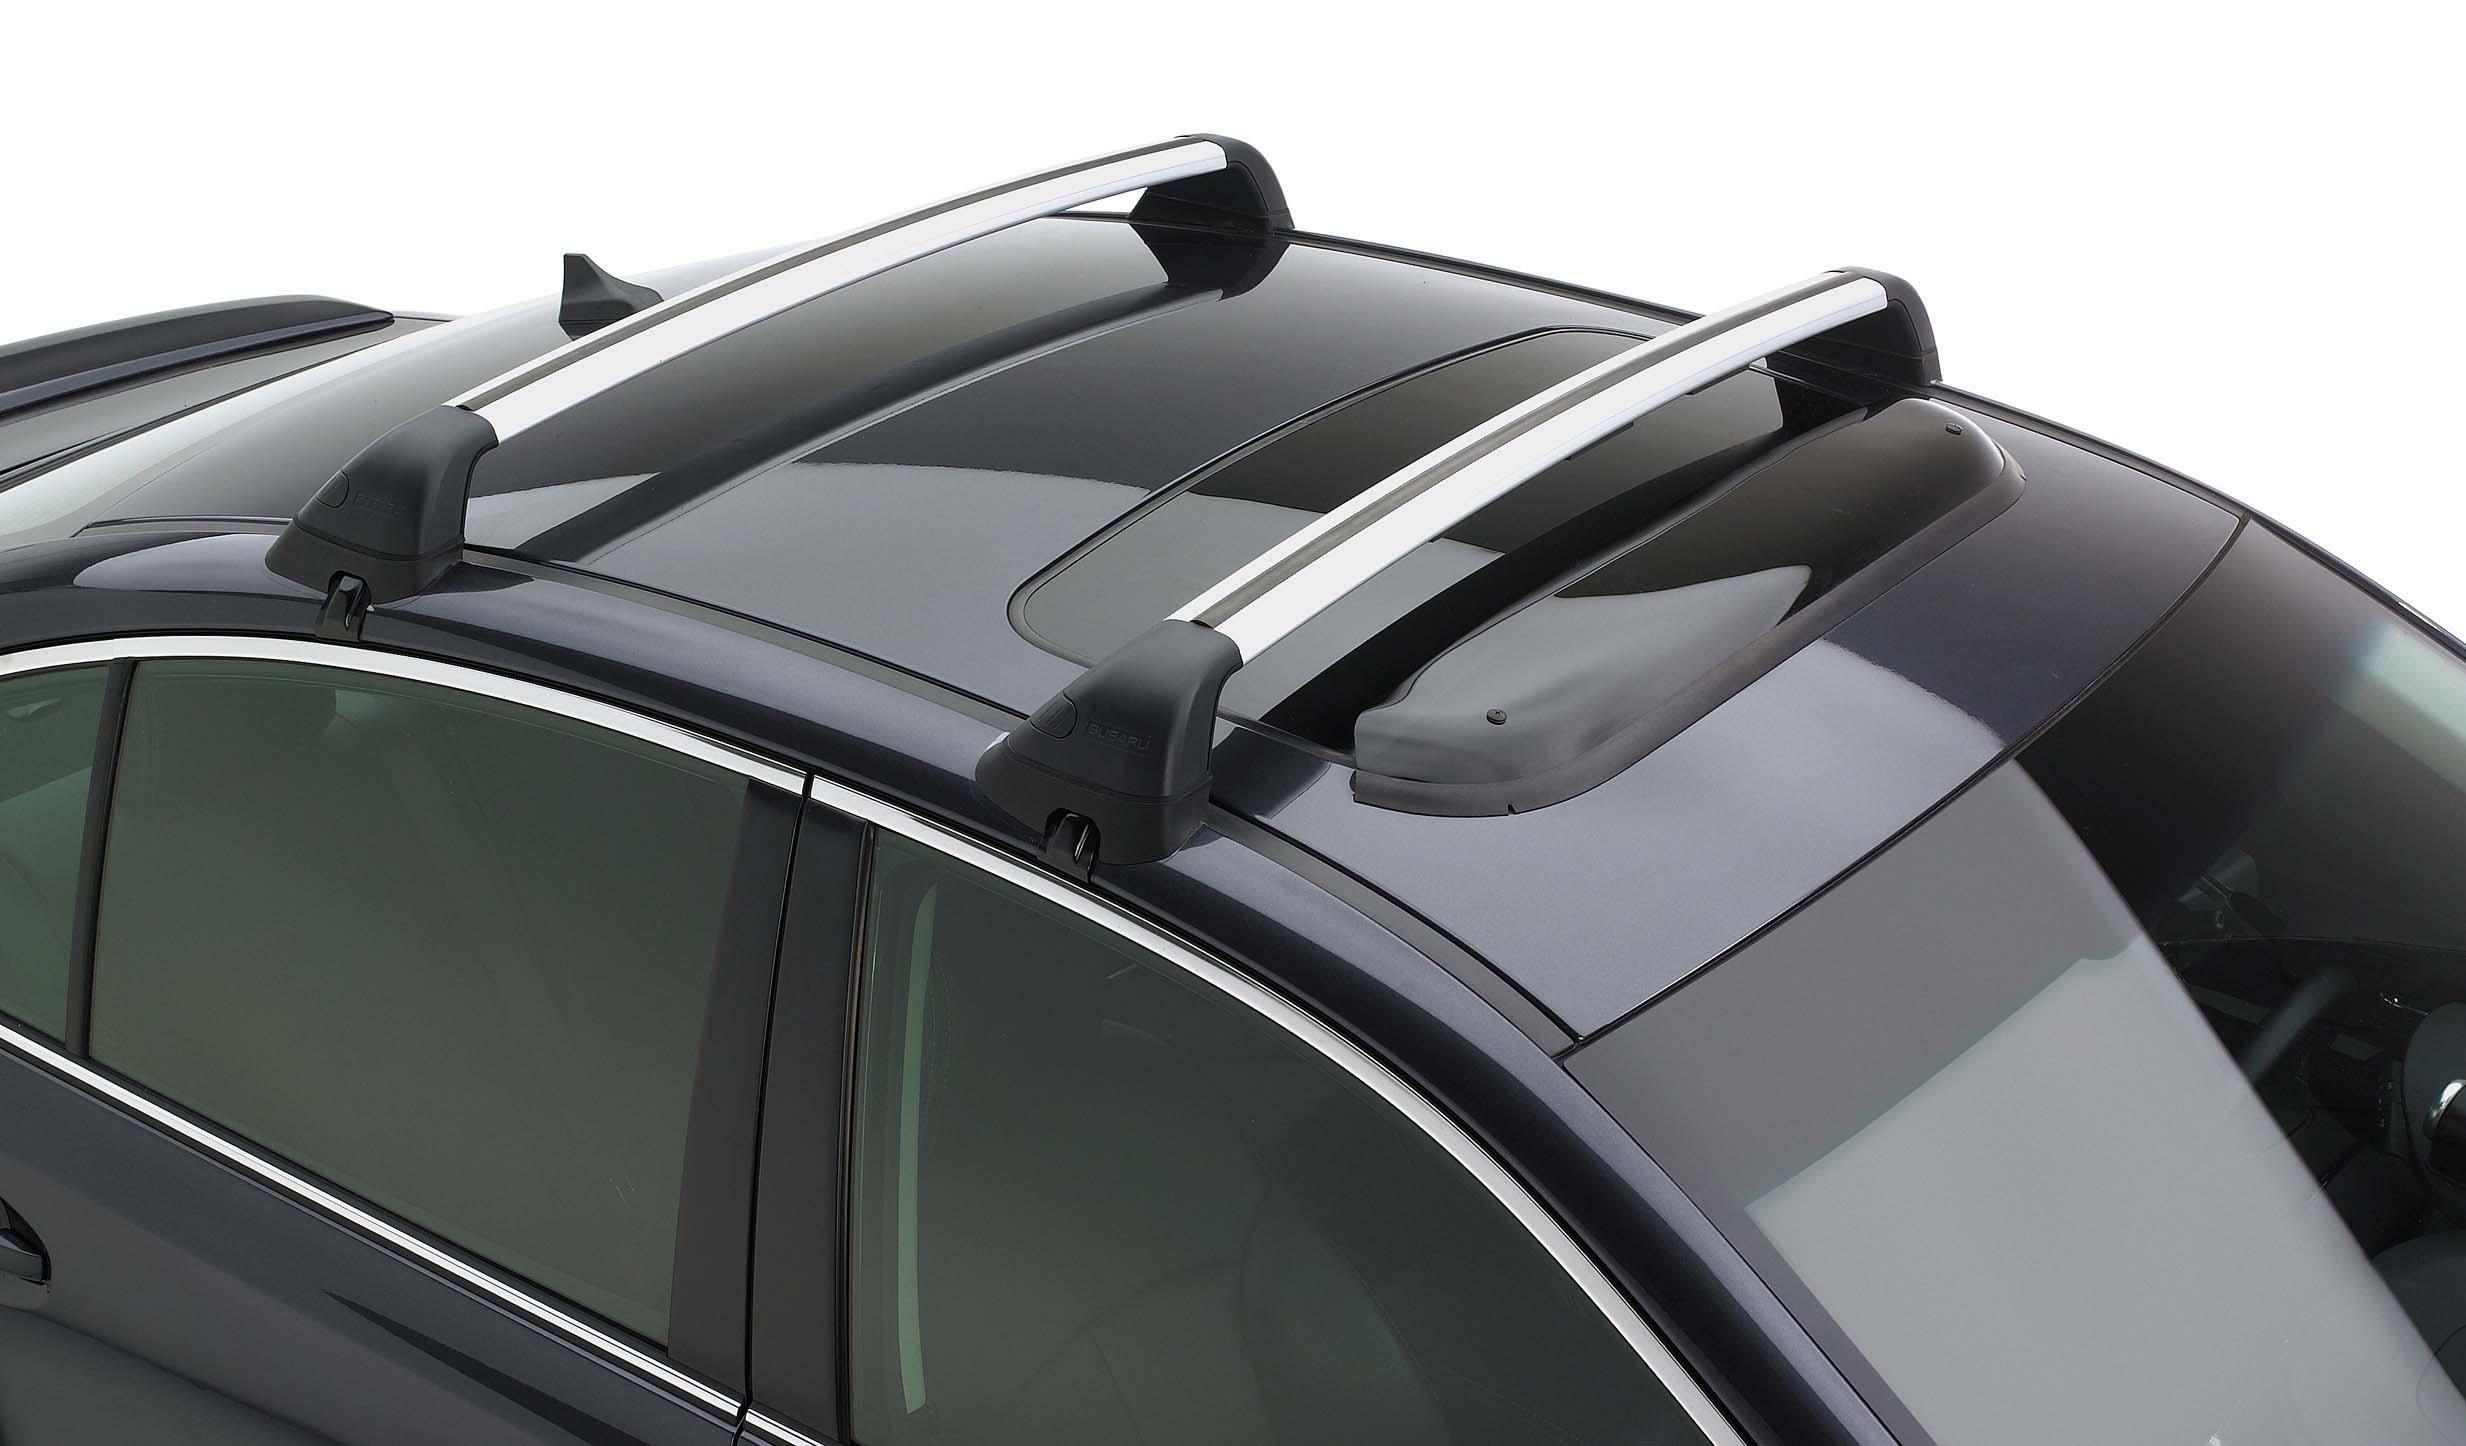 Subaru Northern Blvd >> Subaru Legacy Cross Bar Set - Fixed (Sedan). CROSSBAR SET FIXED - SDN - E3610AJ520 | Koeppel ...